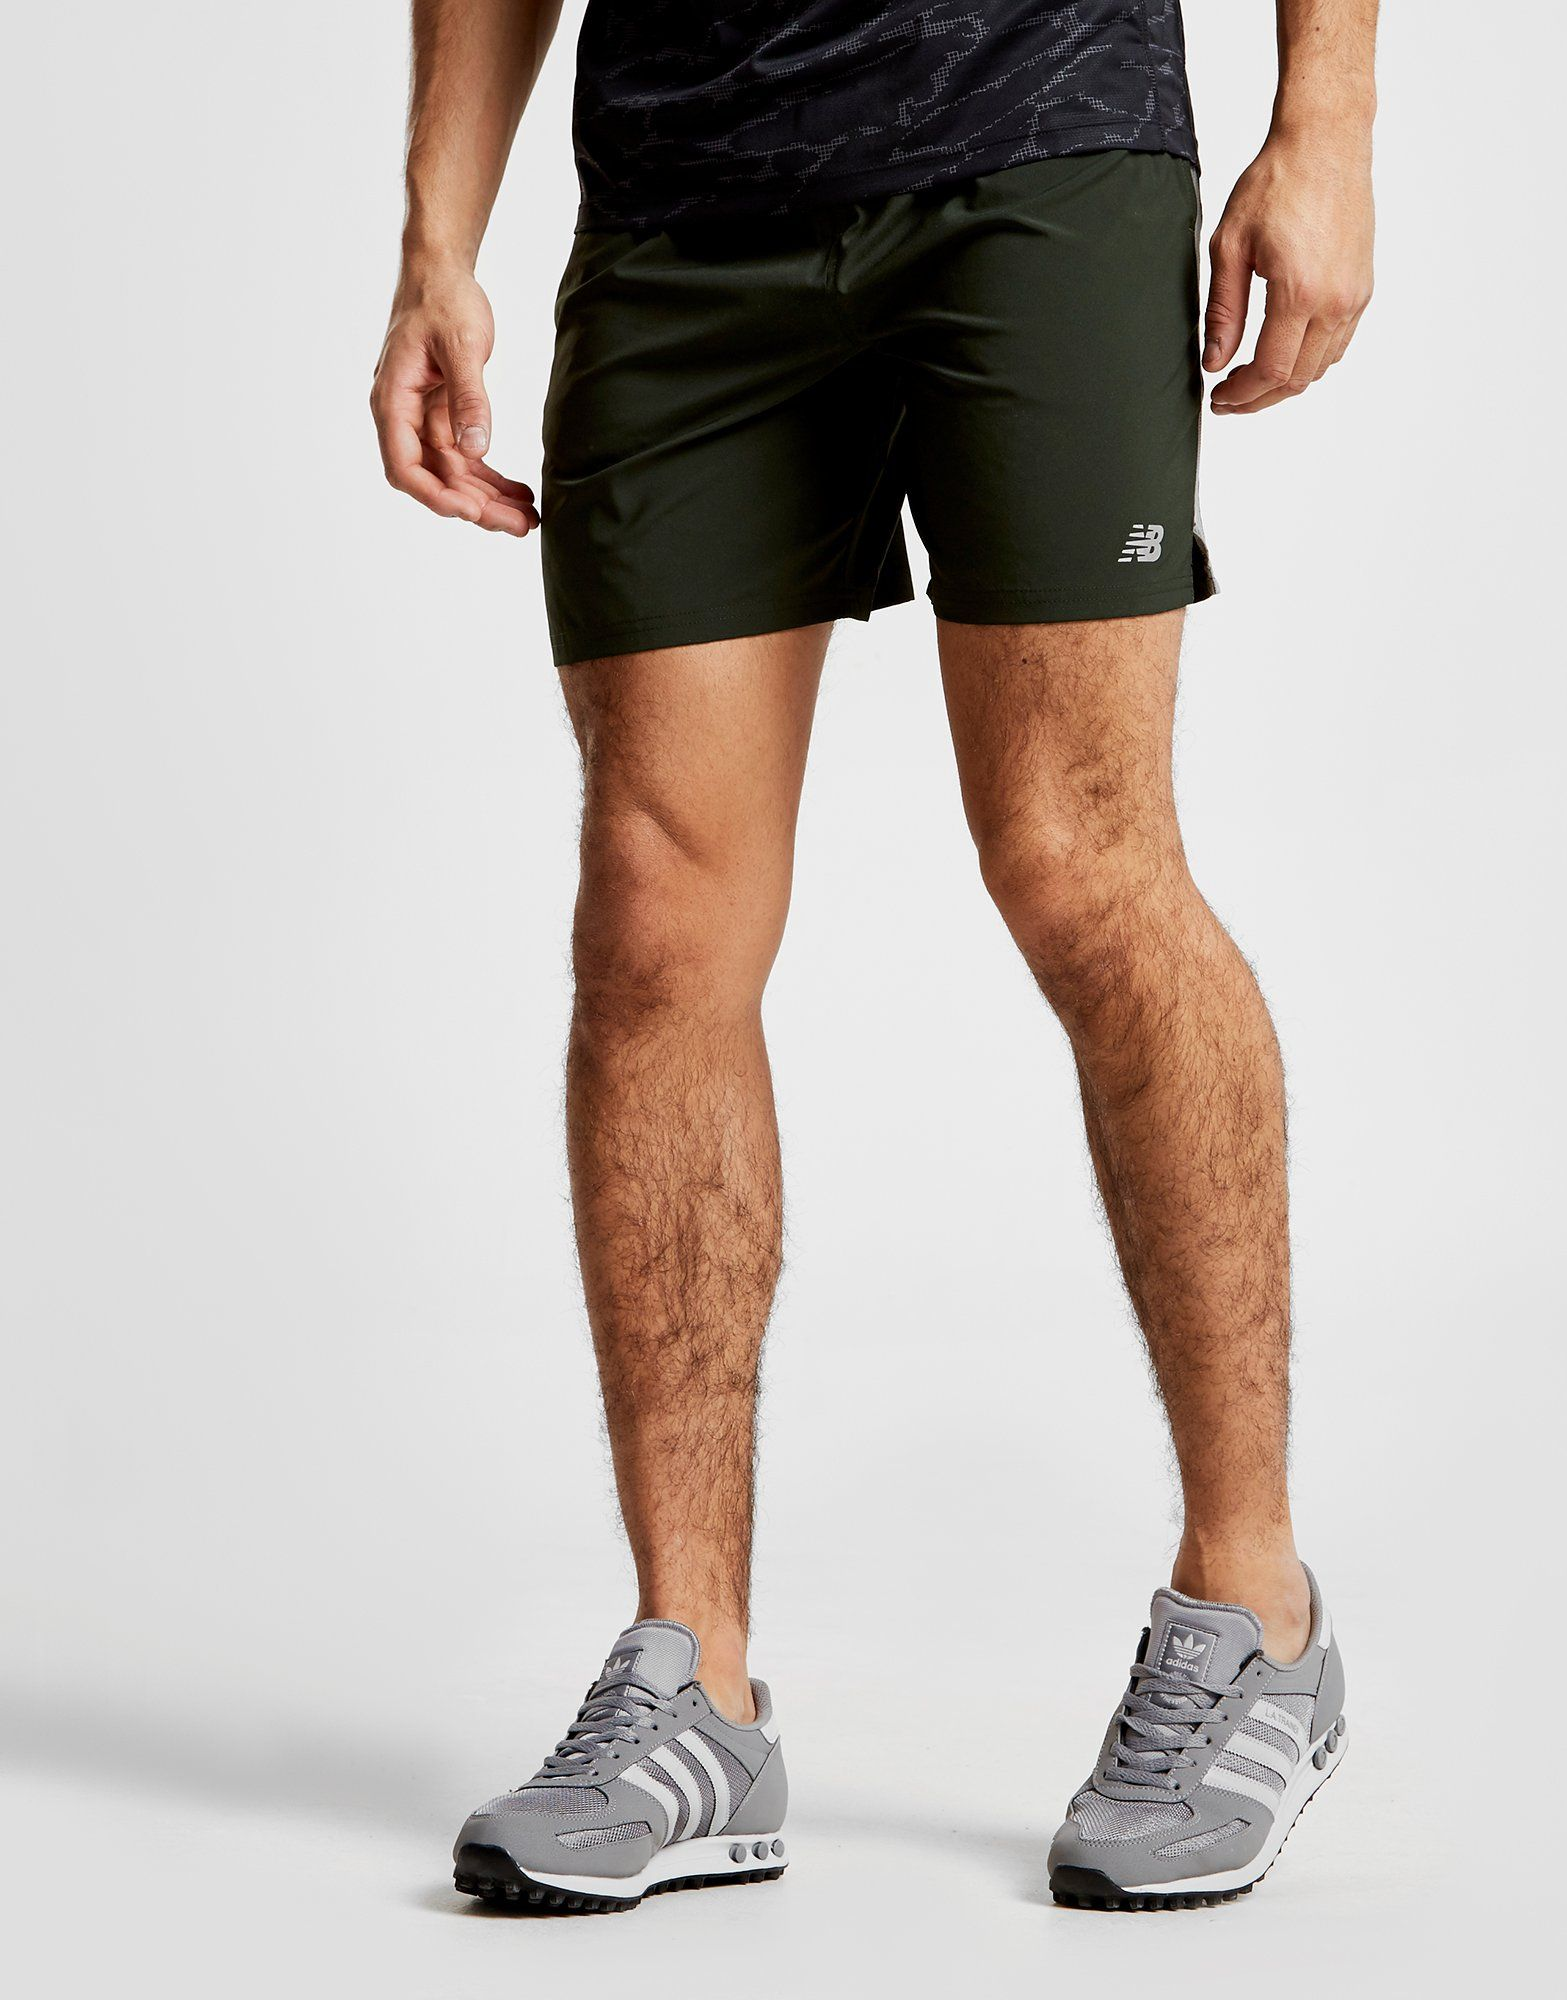 New Balance Core Running Shorts